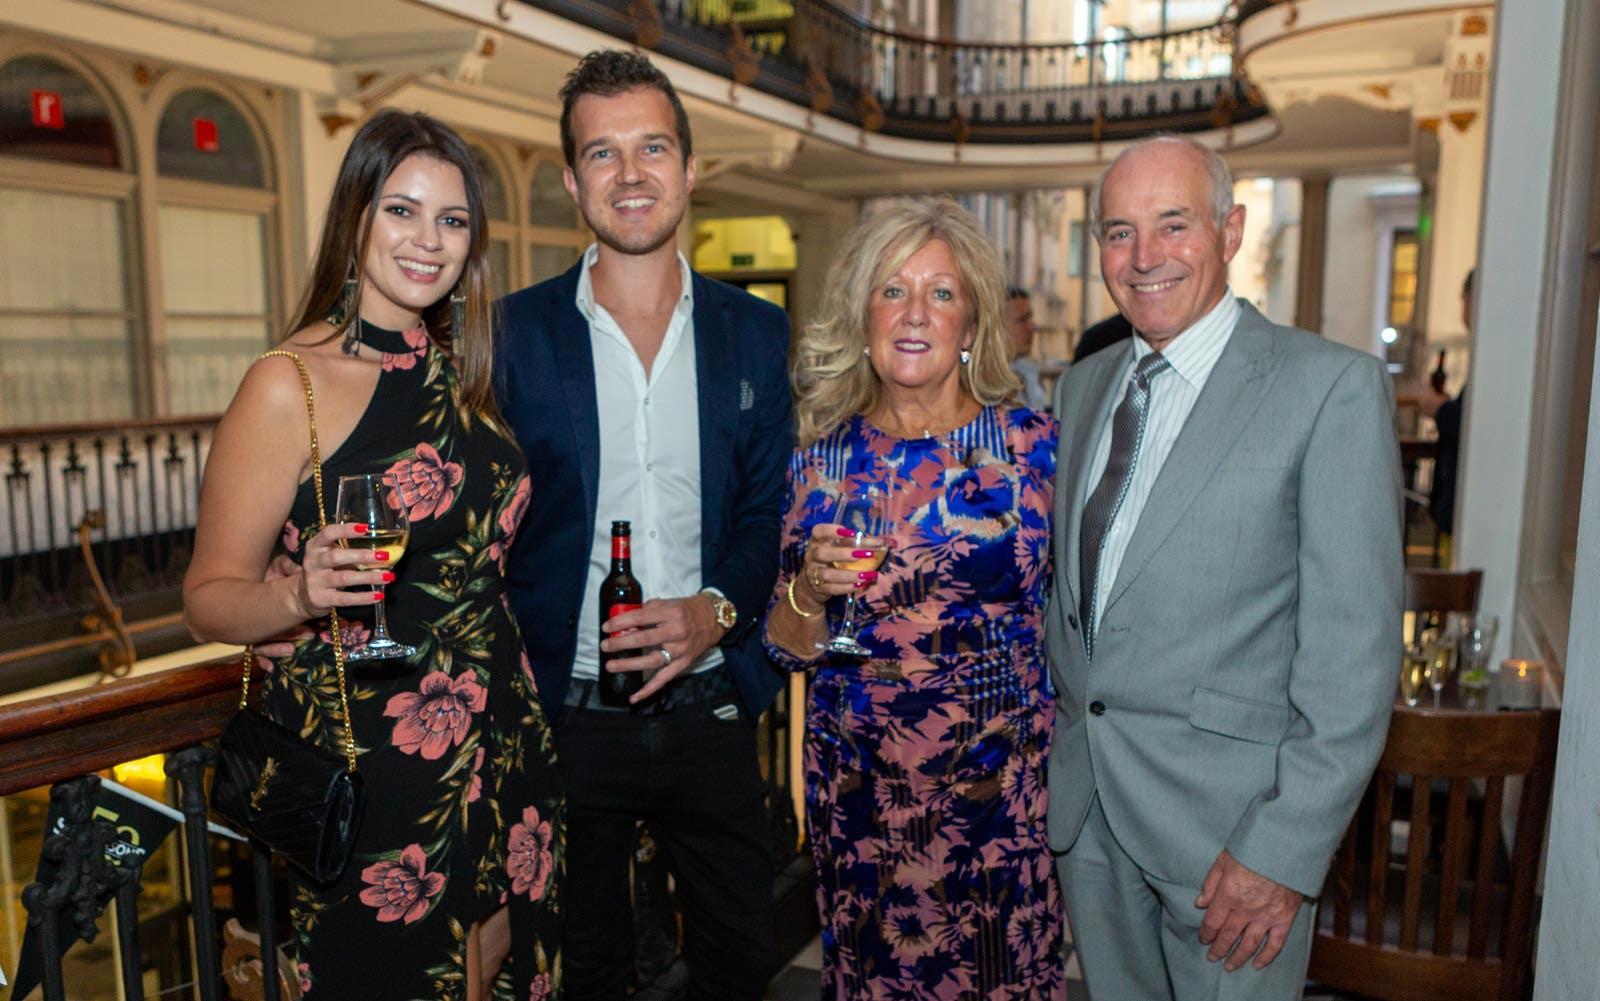 Jennifer, Jordan, Lorraine and Stewart Brookes